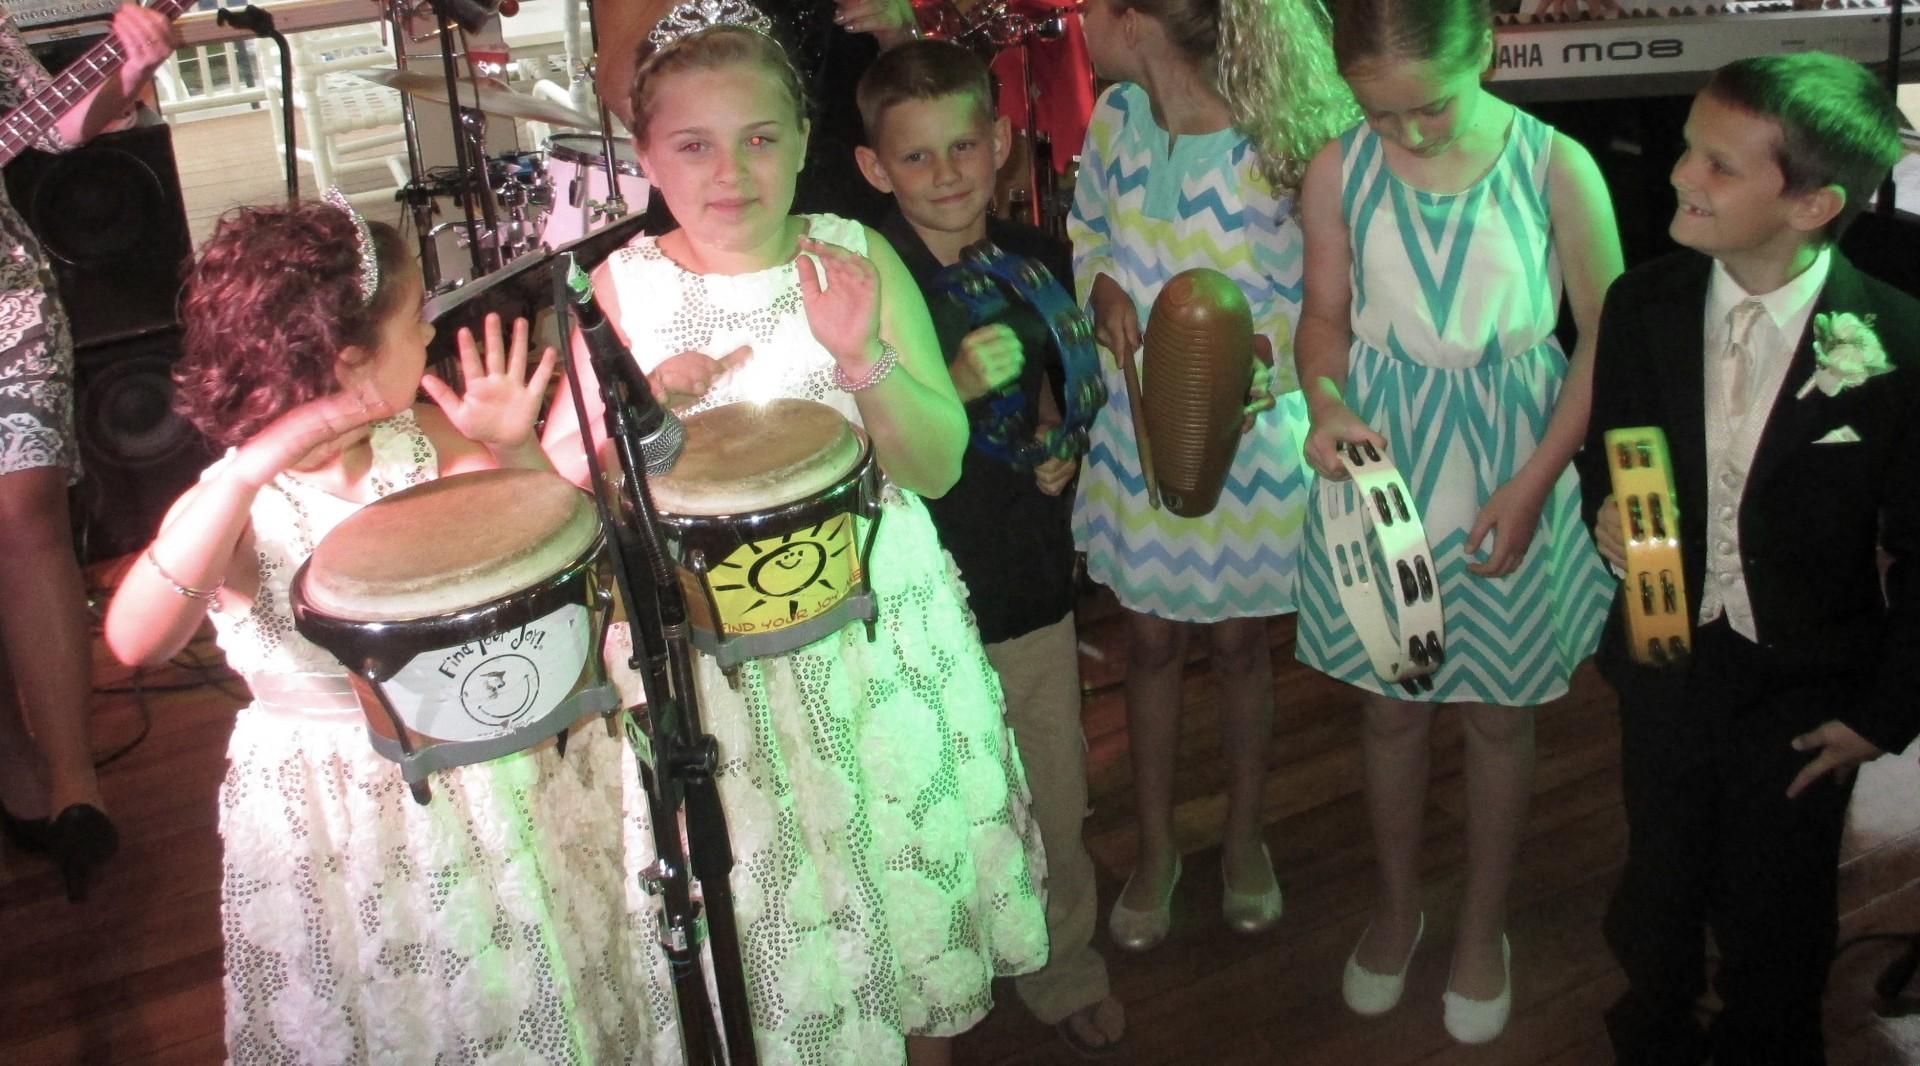 Children participating at Charlotte Harbor Yacht Club Wedding